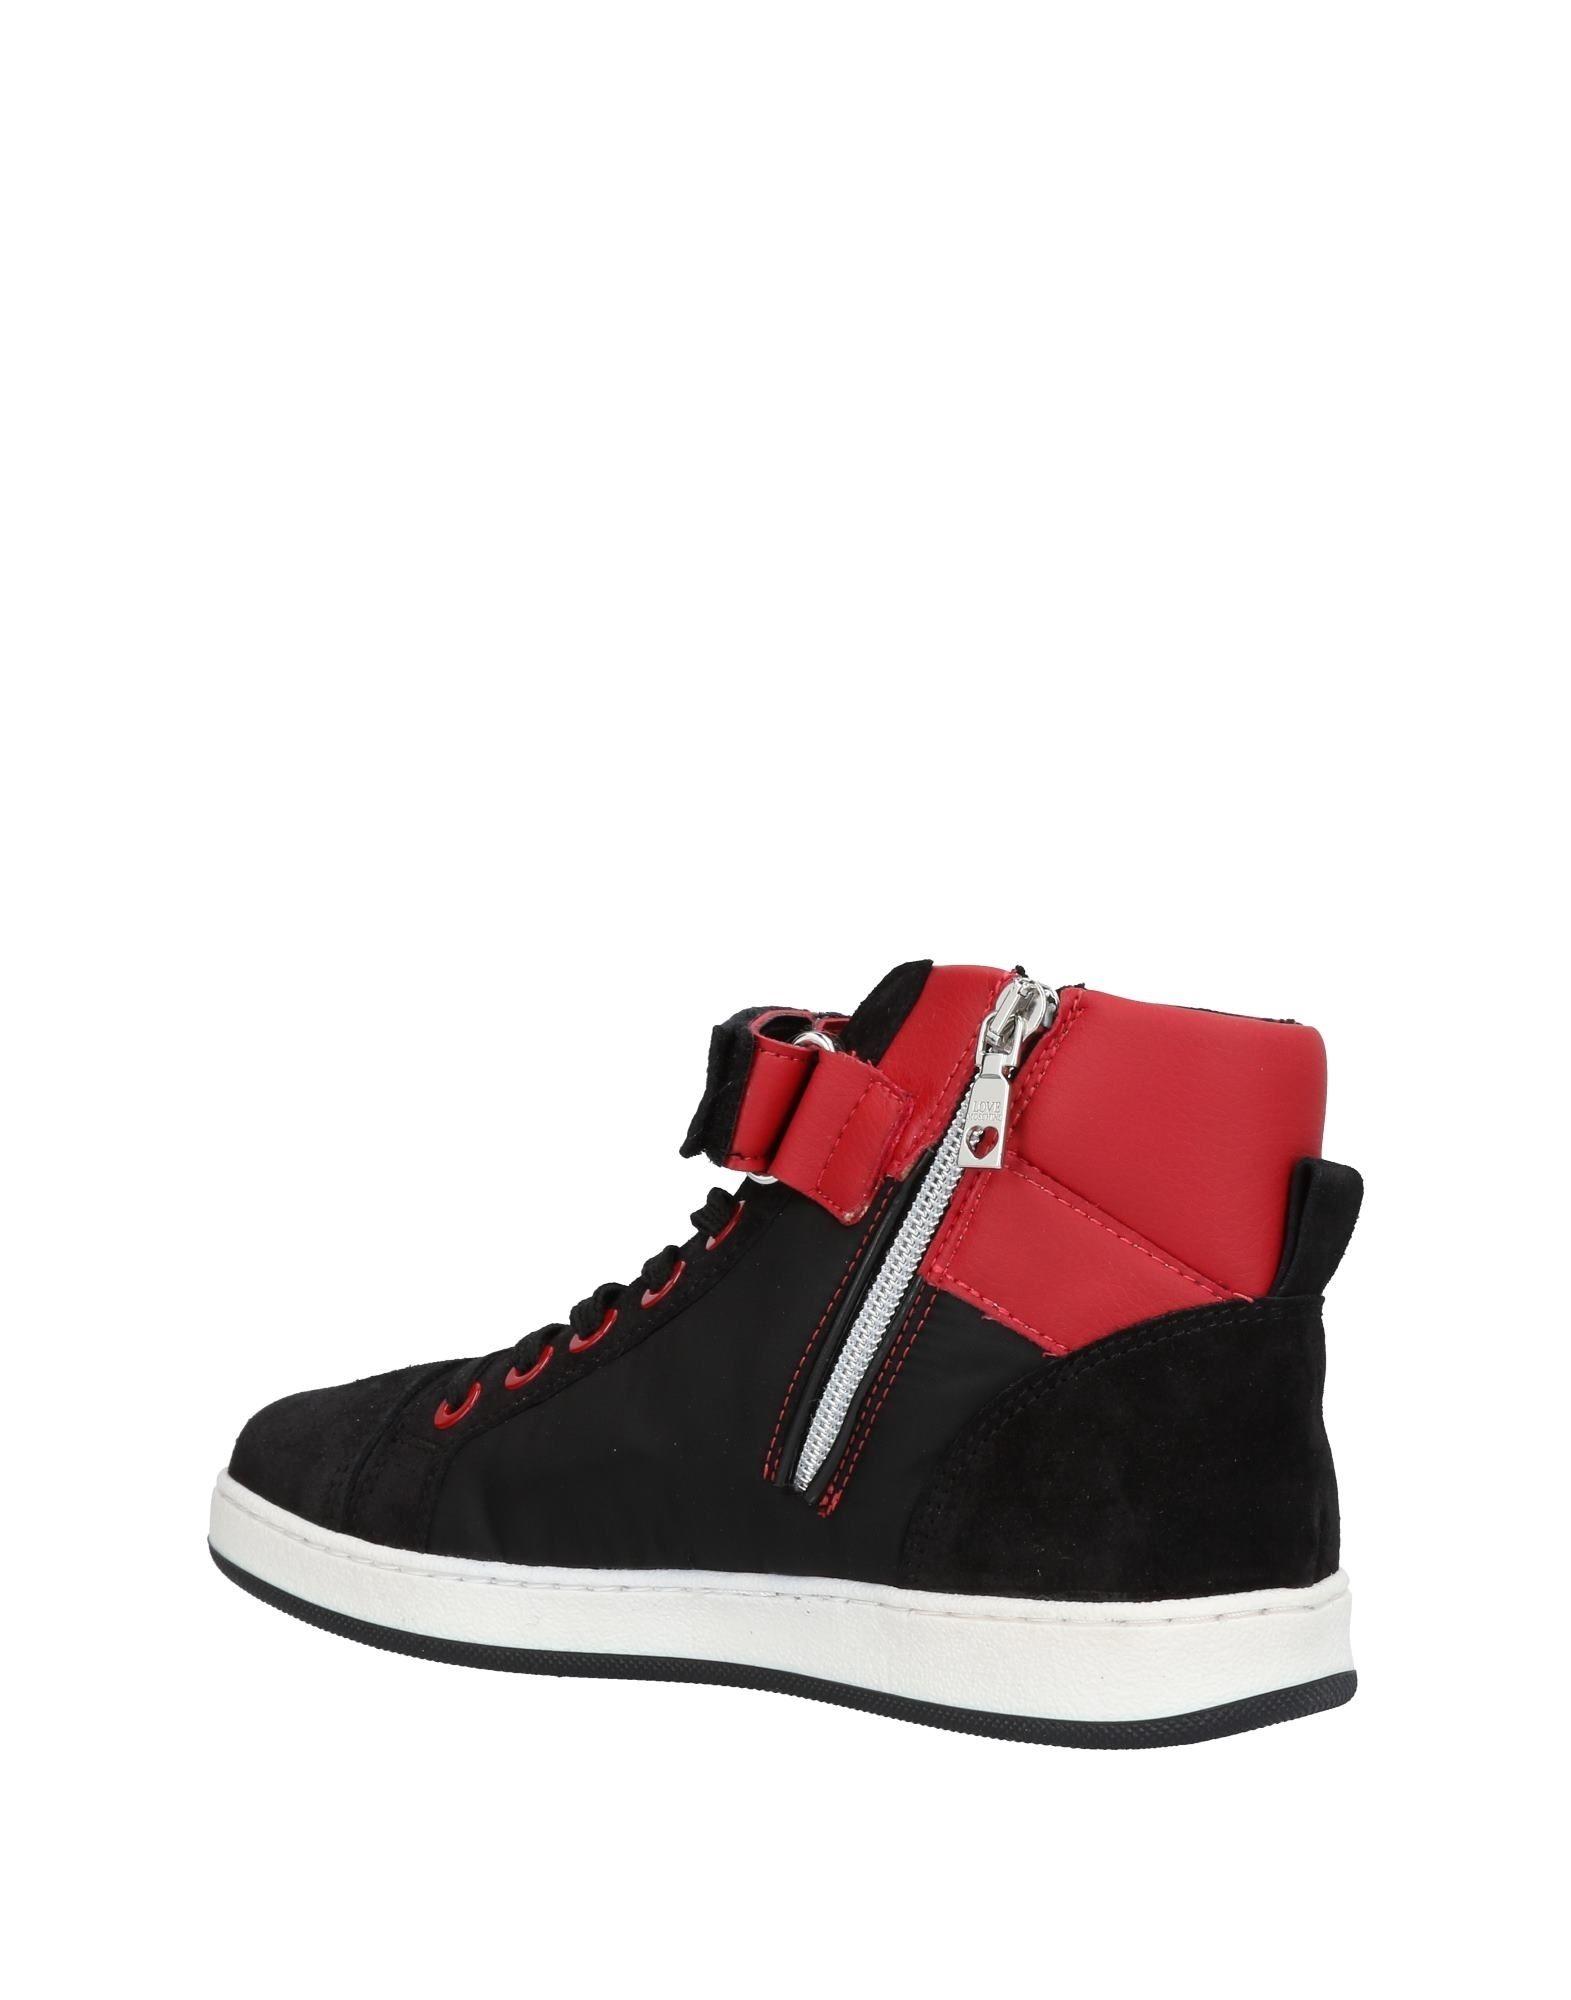 Stilvolle billige Schuhe Love Moschino Sneakers Damen Damen Damen  11455879BD bb0f65